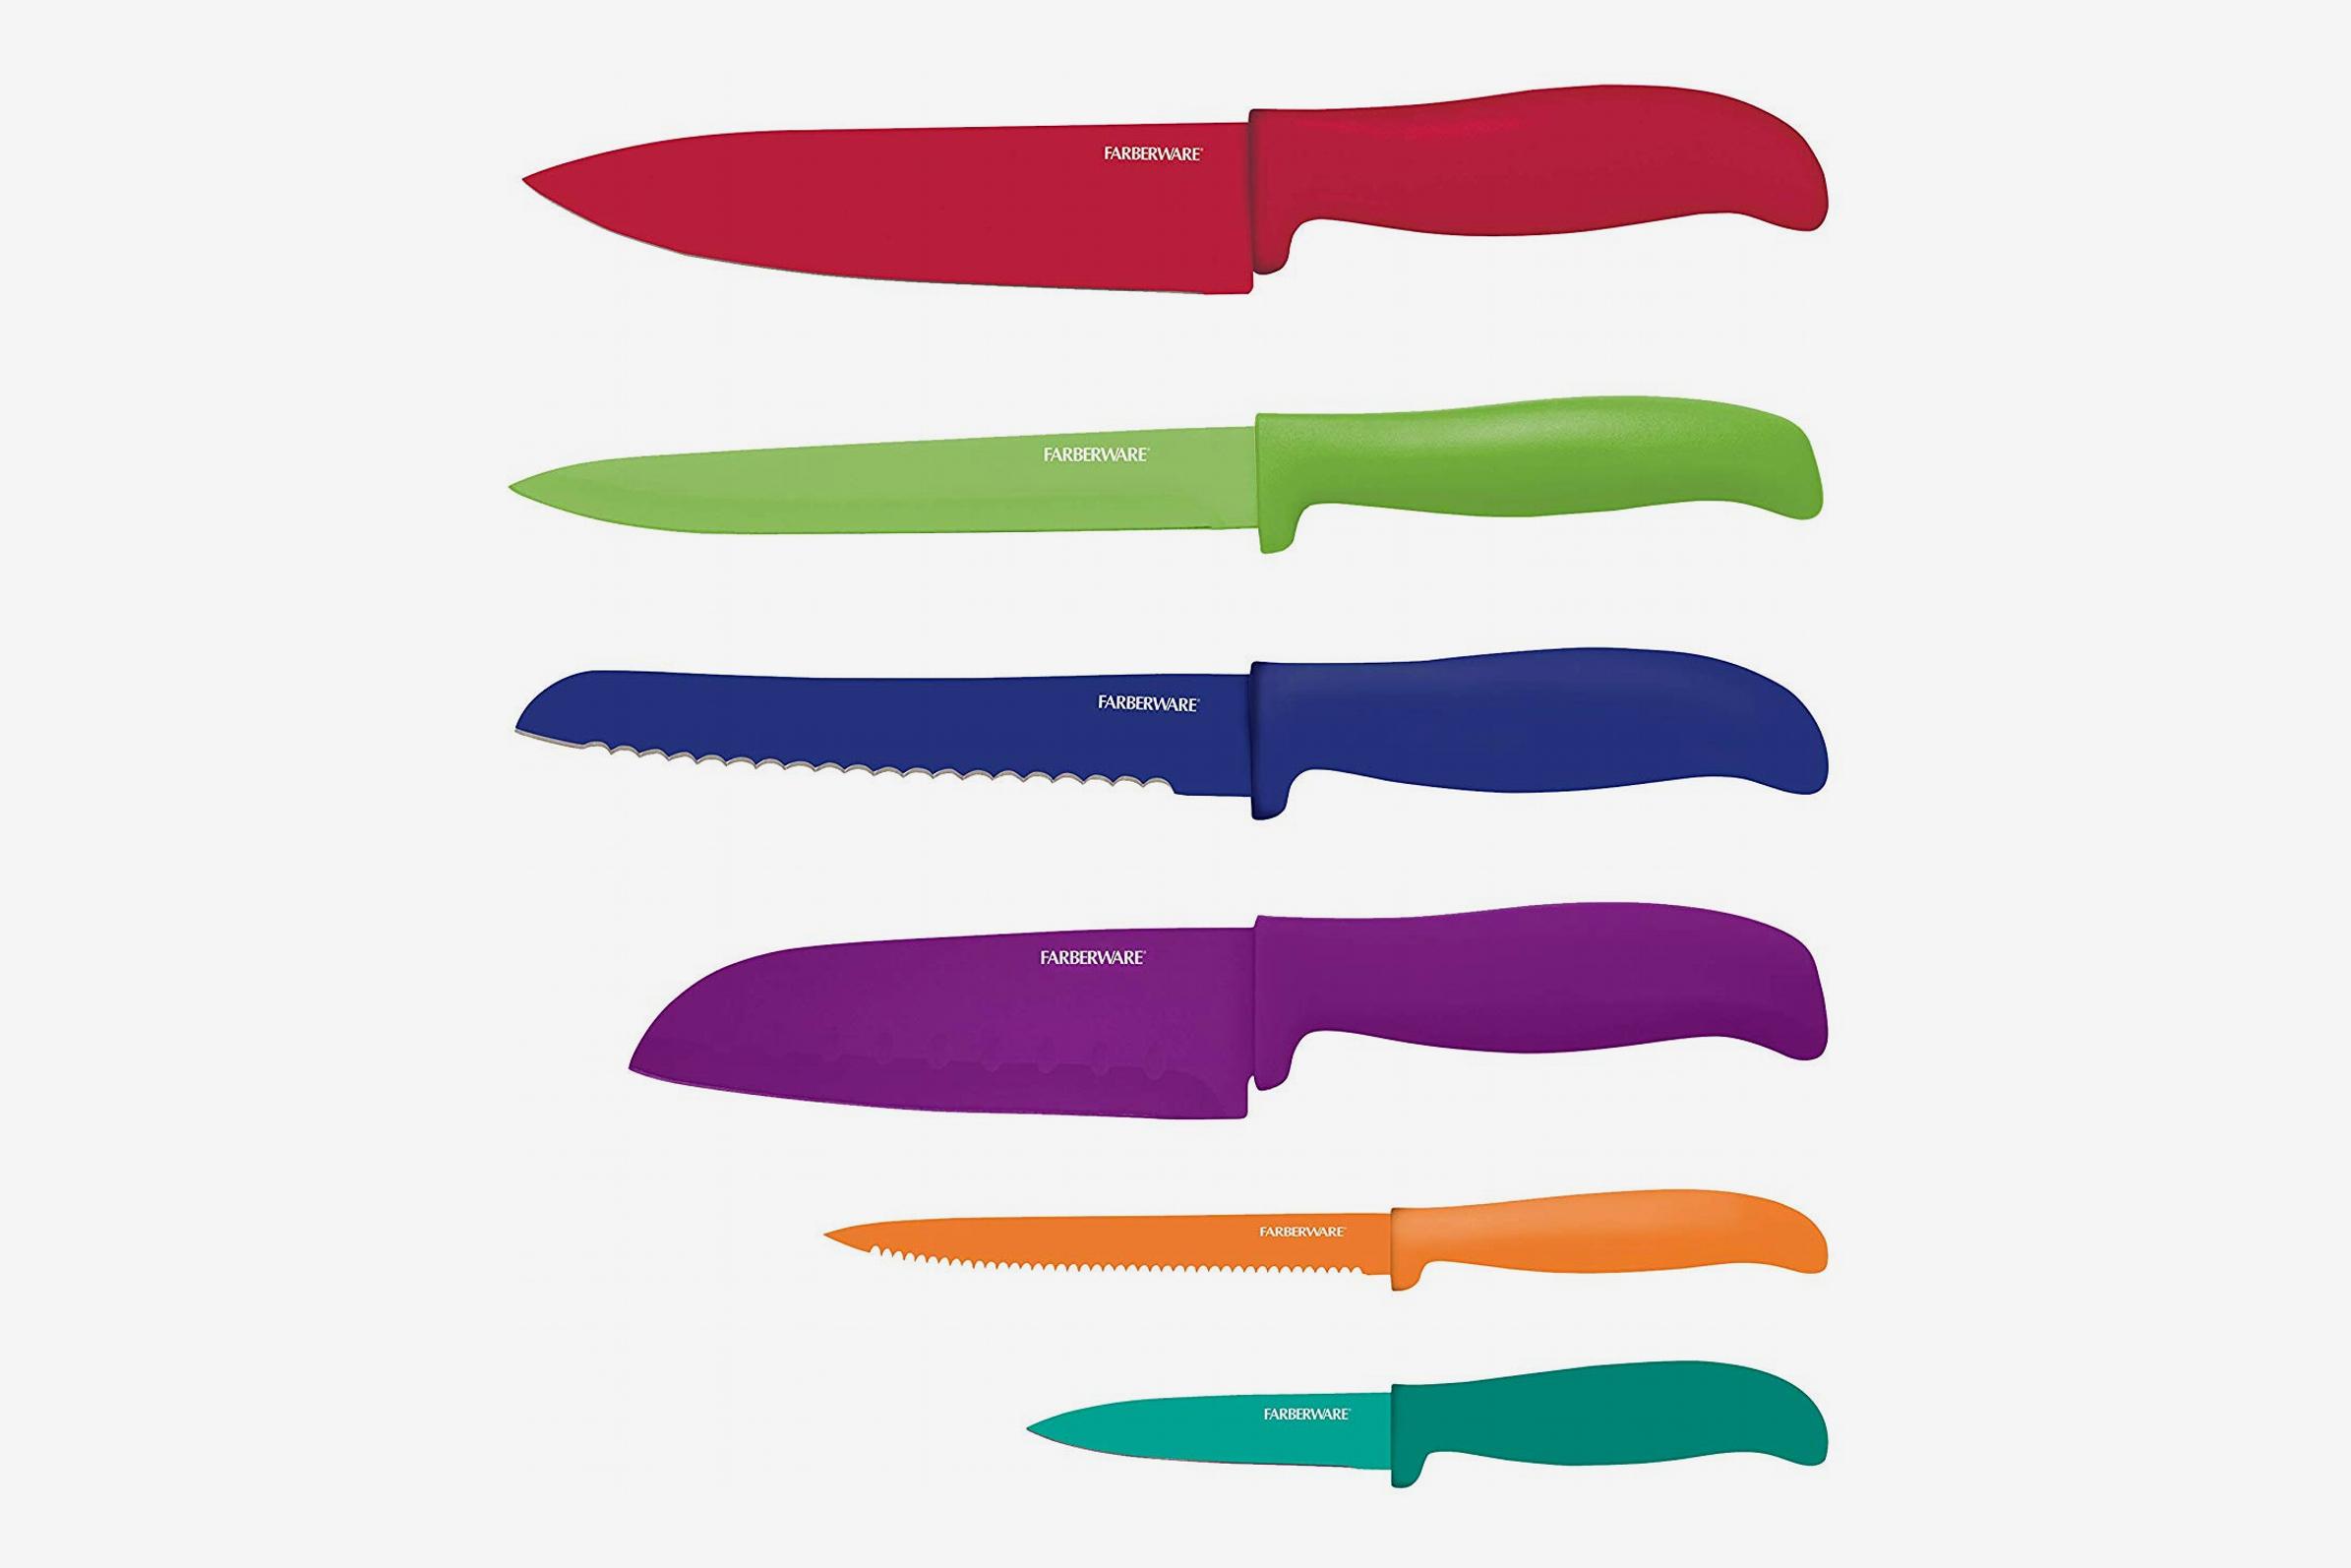 Farberware 12-Piece Resin Knife Set